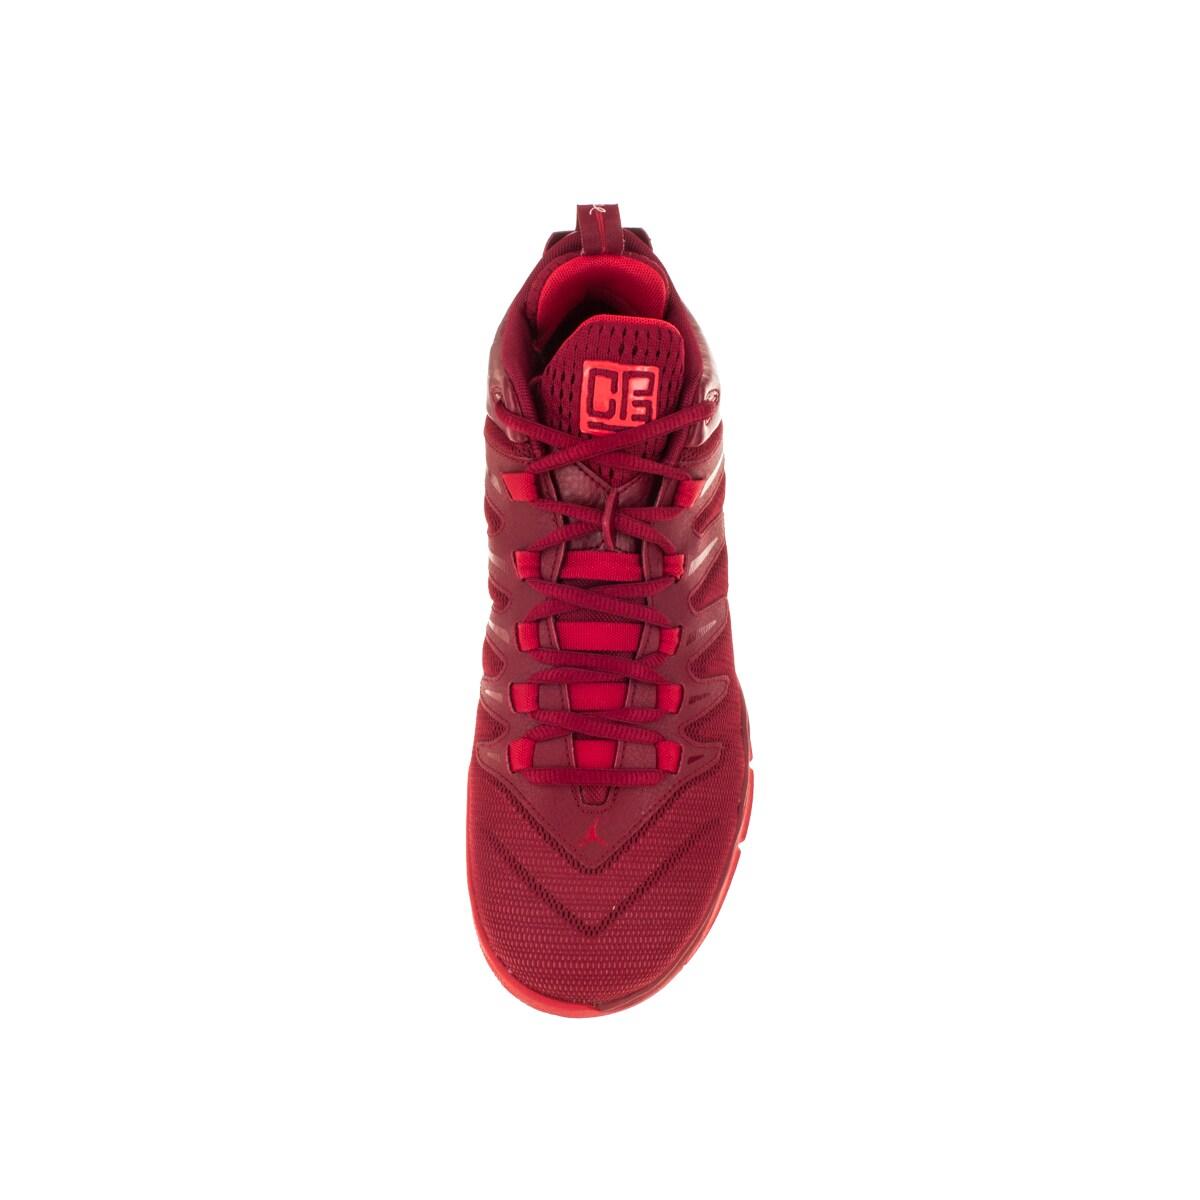 ce21030038335c Shop Nike Jordan Men s Jordan Cp3.Ix Gym Red Chllng Red  Basketball Shoe -  Free Shipping Today - - 12318255